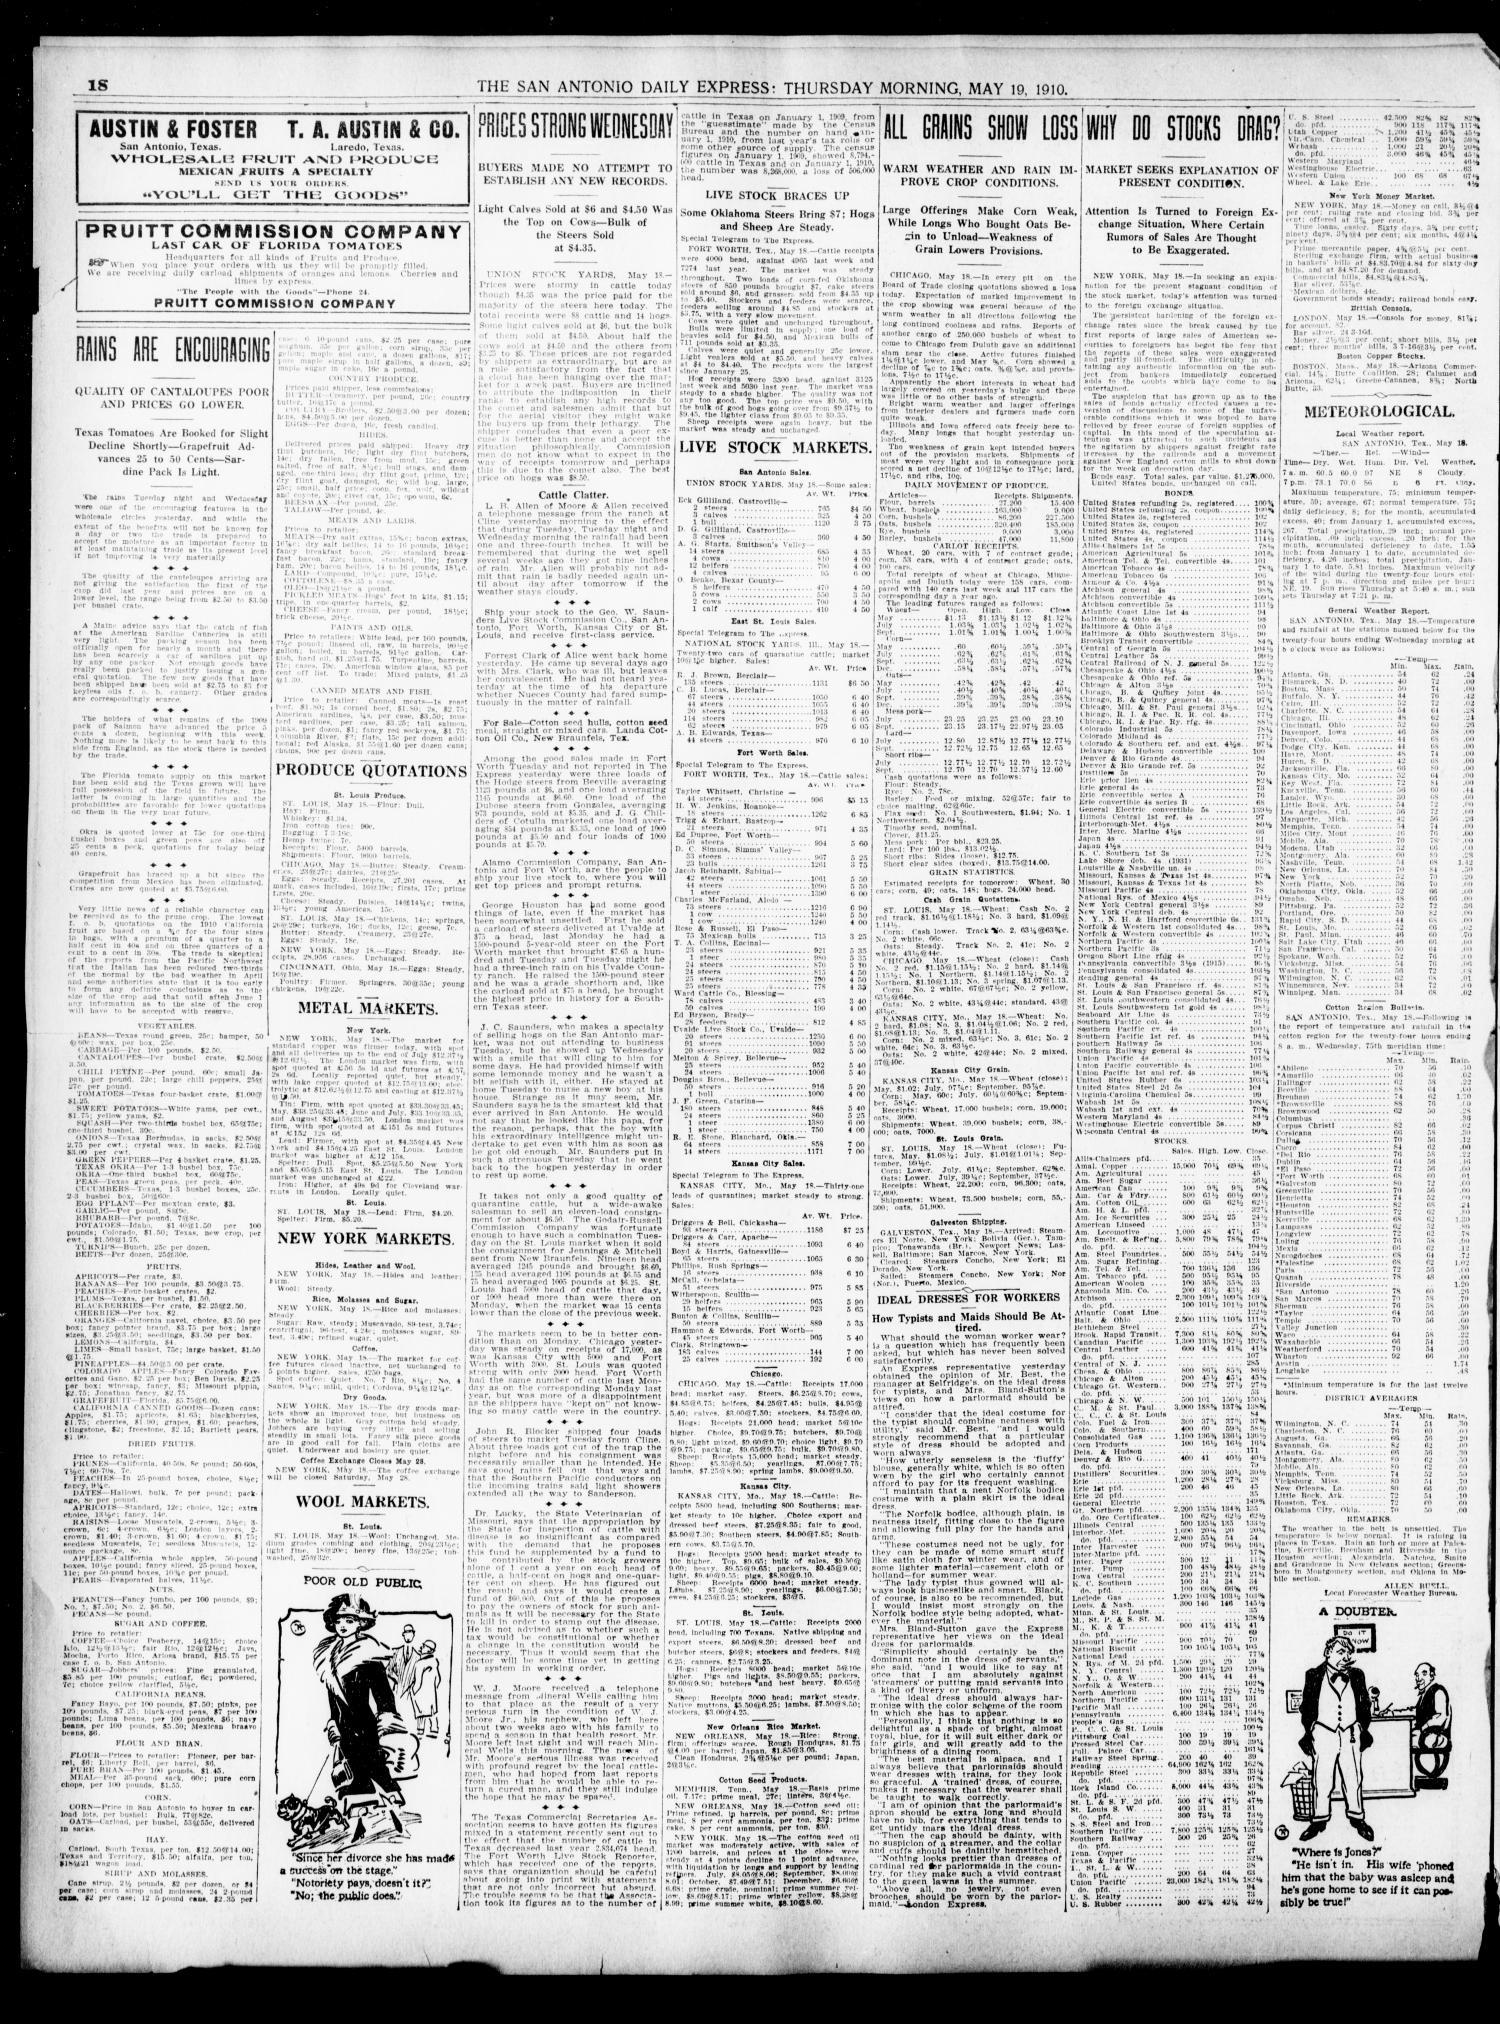 The Daily Express  (San Antonio, Tex ), Vol  45, No  139, Ed  1